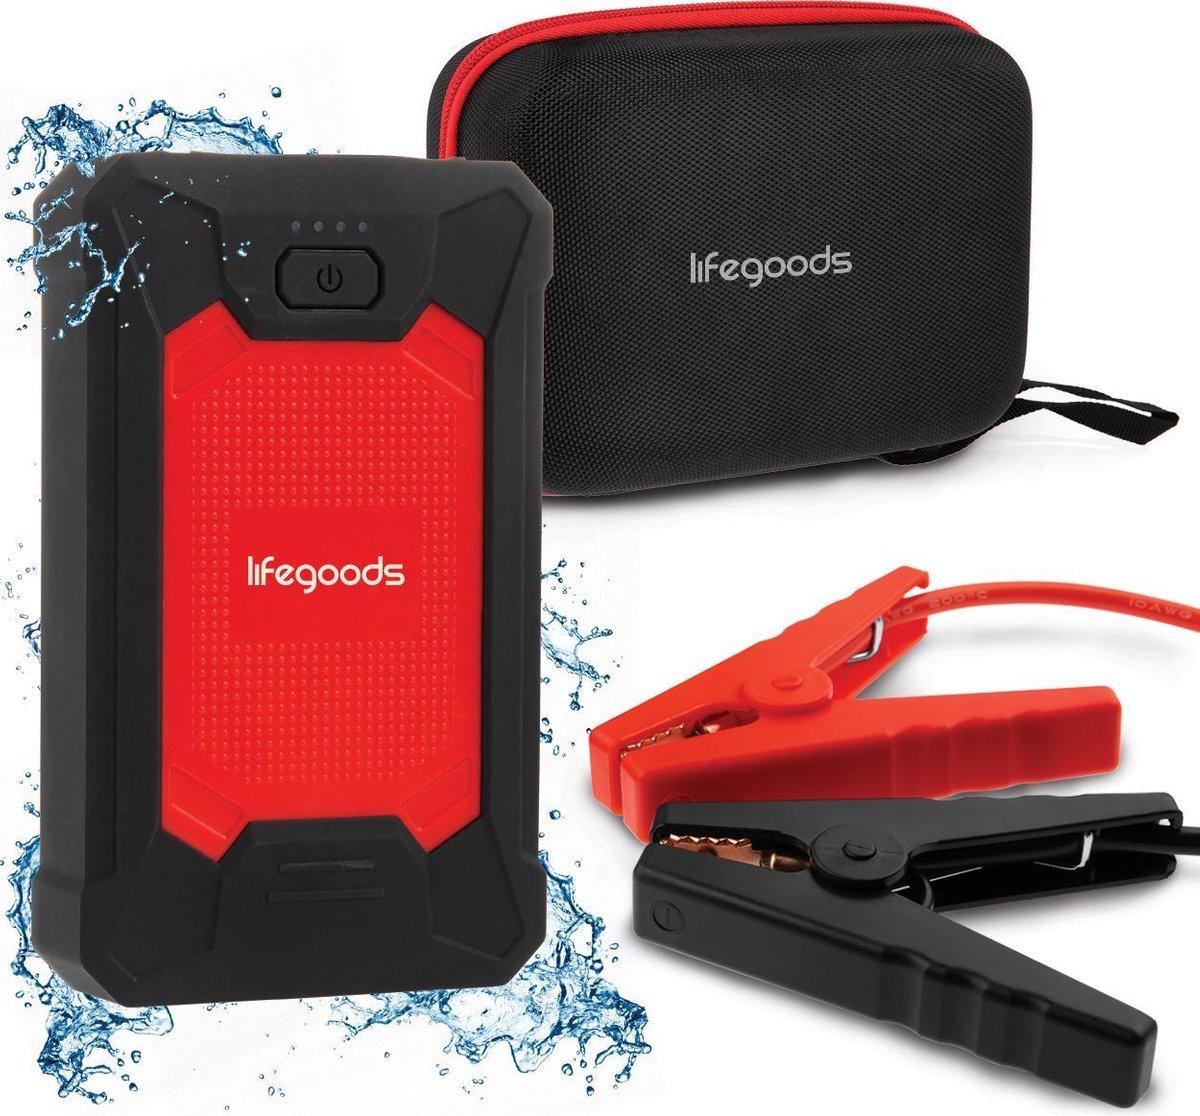 LifeGoods 12V Jump Starter - 600A - 4-in-1 Starthulp, Powerbank, LED Zaklamp en SOS Noodlicht - Rood